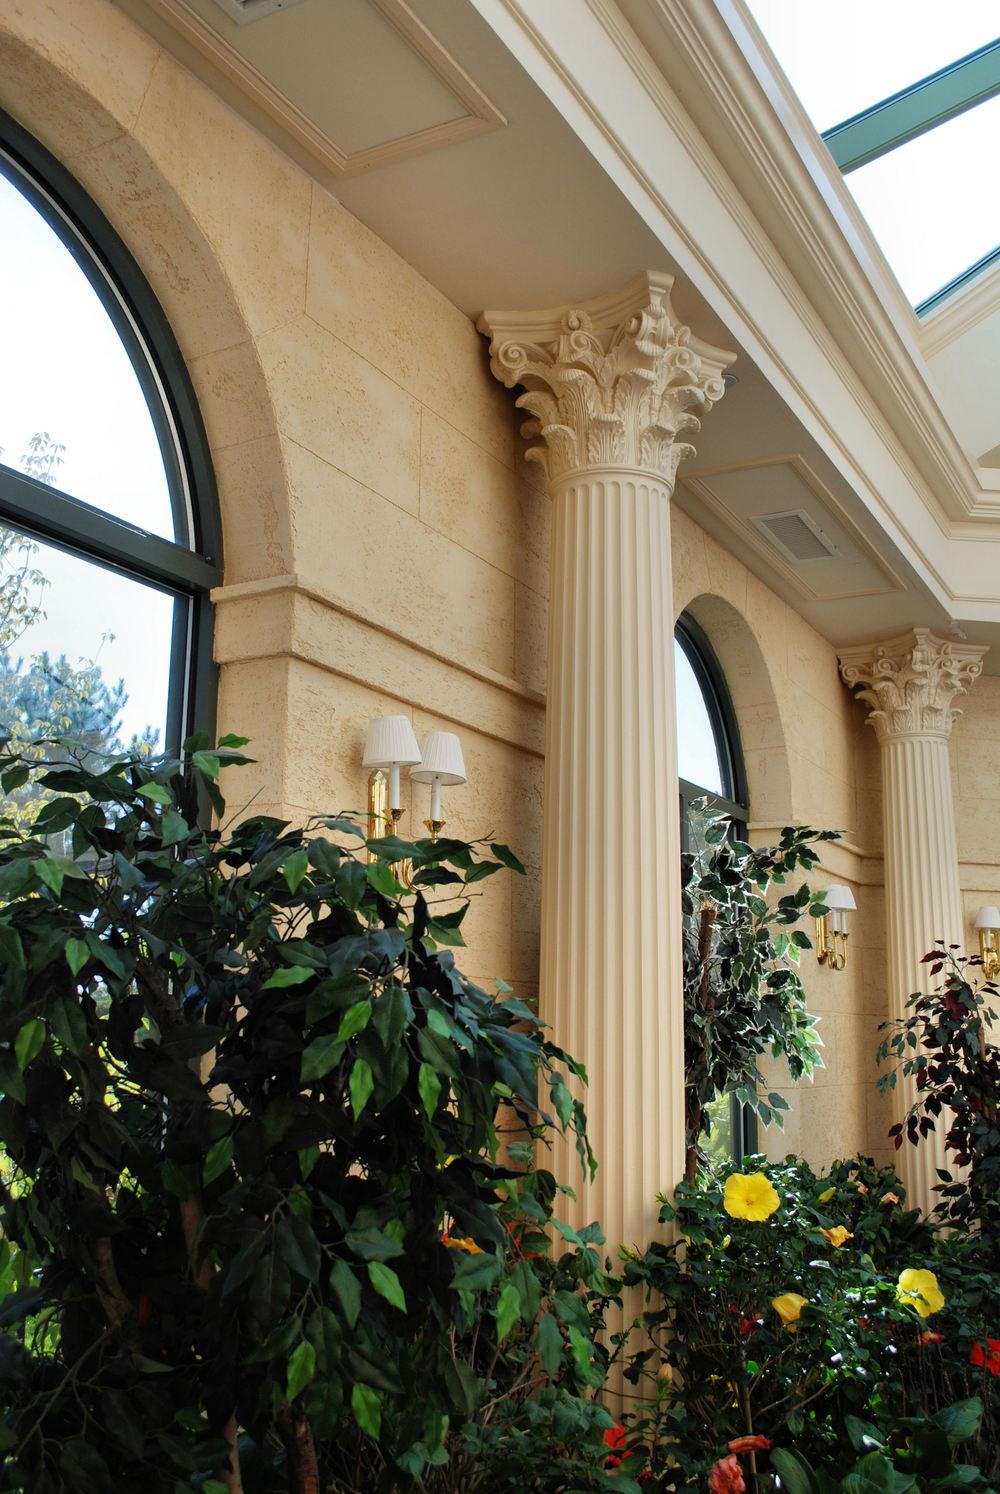 Desmond Hotel - Tuscany Plaster